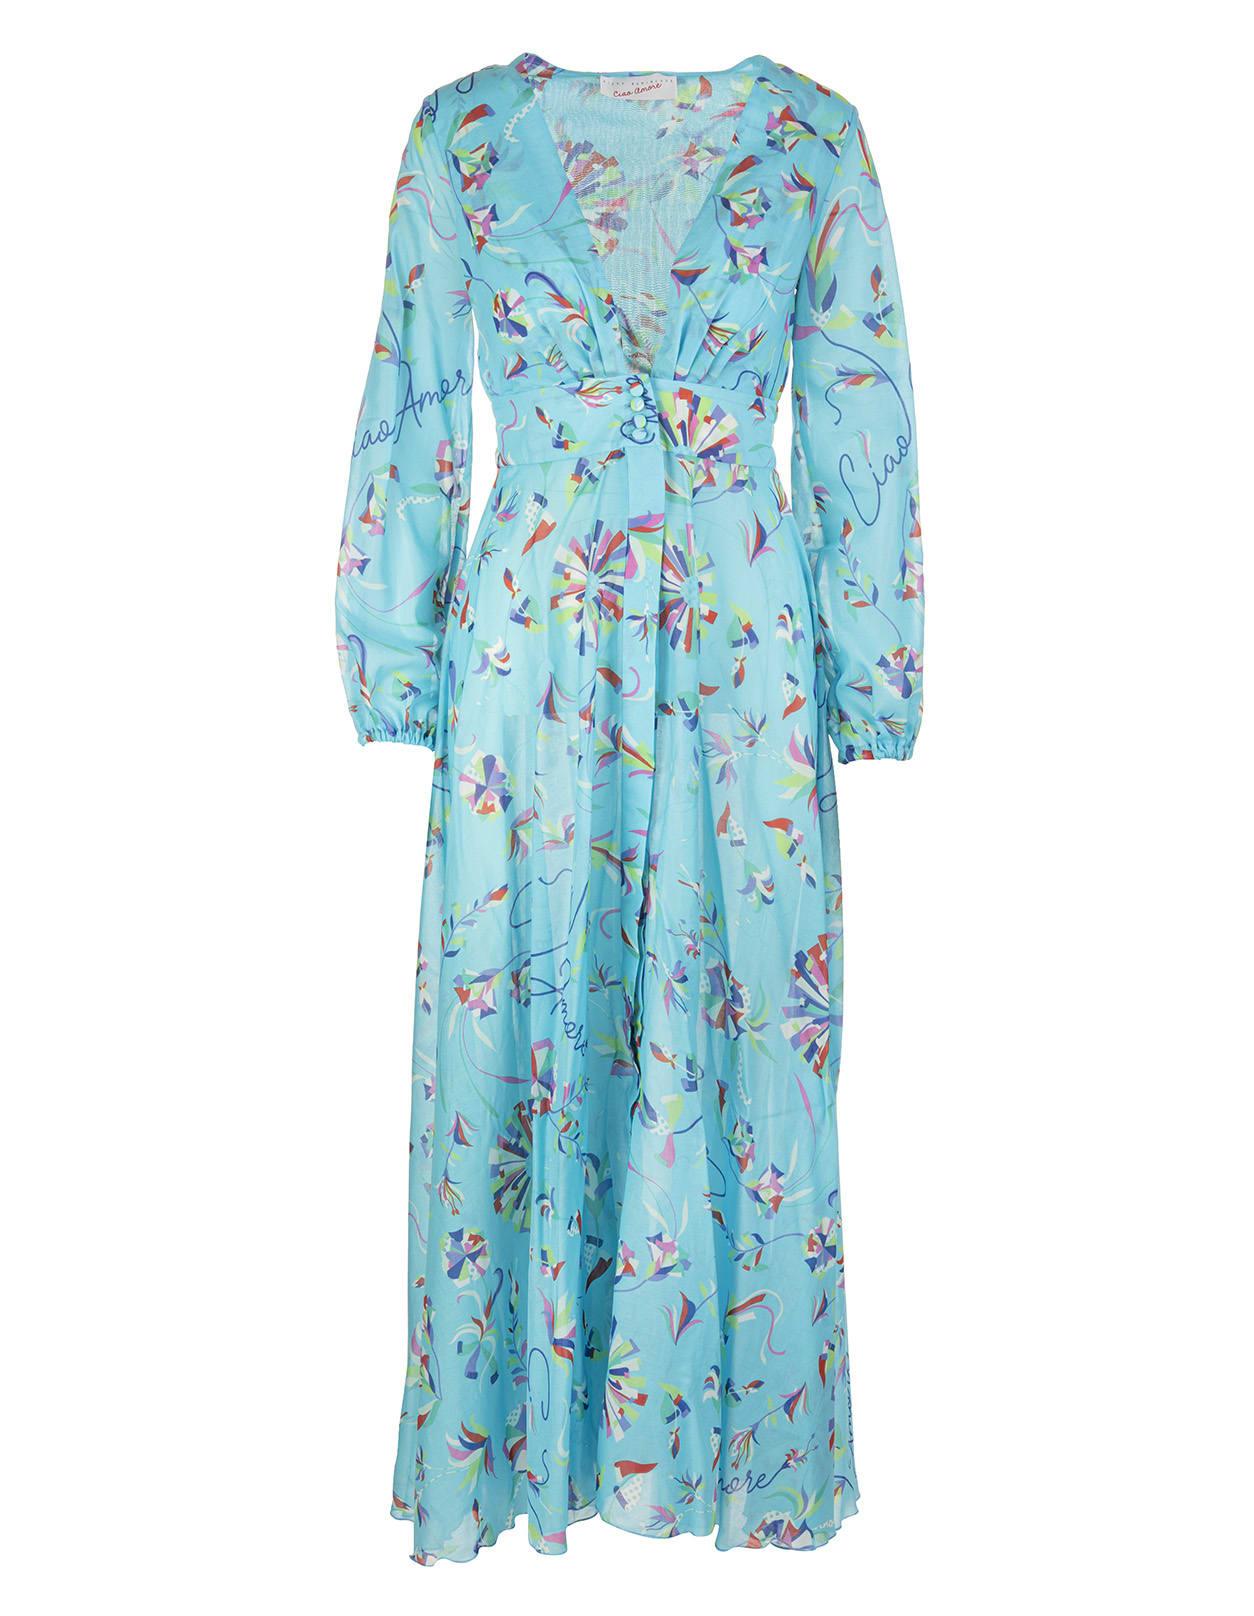 Light Blue Printed Long Dress With V-neck